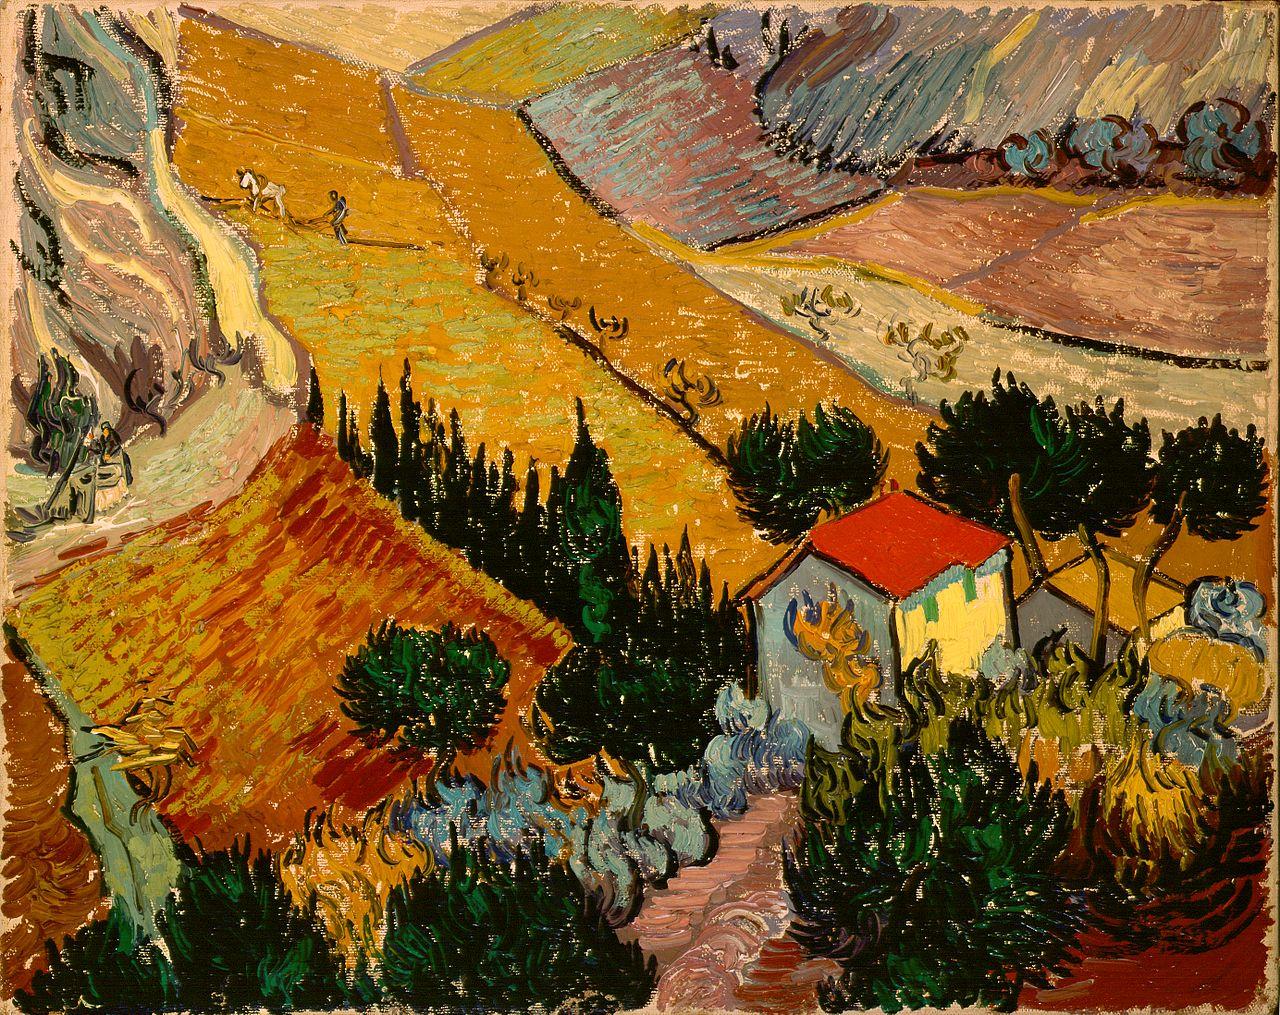 File:Gogh, Vincent van - Landscape with House and Ploughman.jpg ...